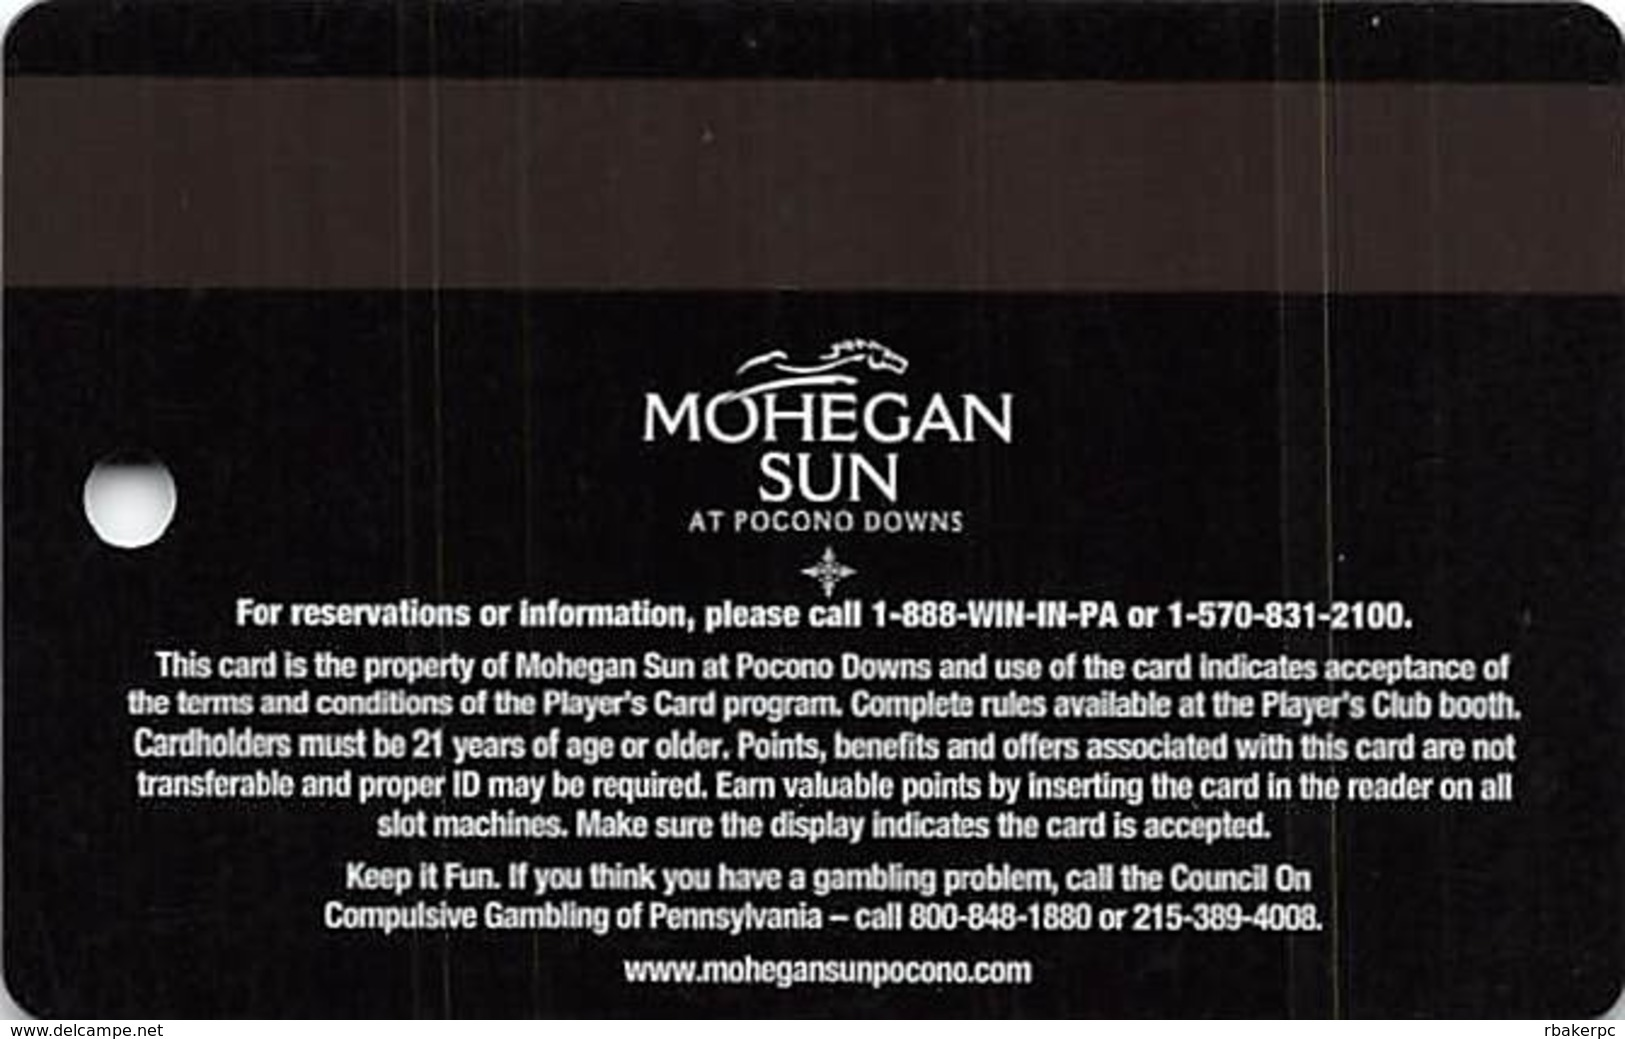 Mohegan Sun Casino At Pocono Downs - Wilks-Barre, PA USA - Hard To Find Sagamore Club Slot Card - Casino Cards